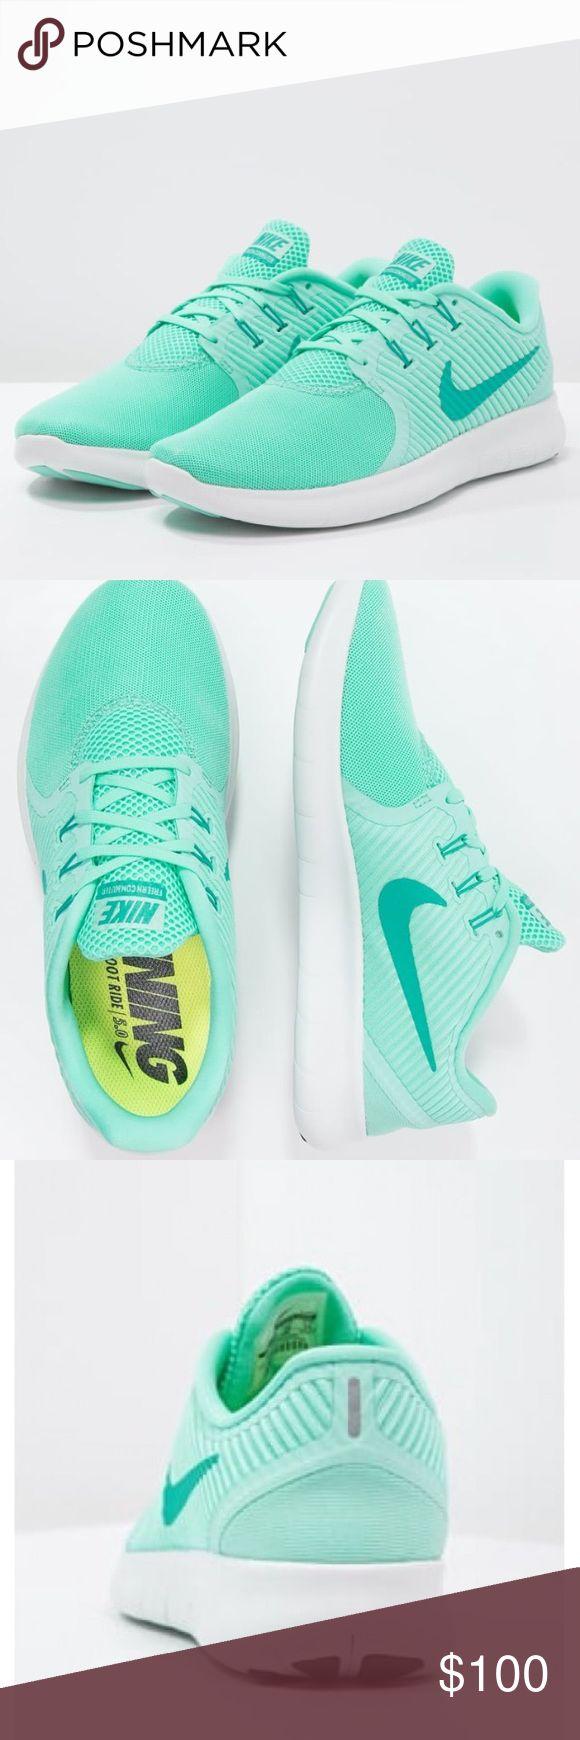 Nike Free Run size 7 Women's size 7 new with original box Nike Free Run Nike Shoes Sneakers